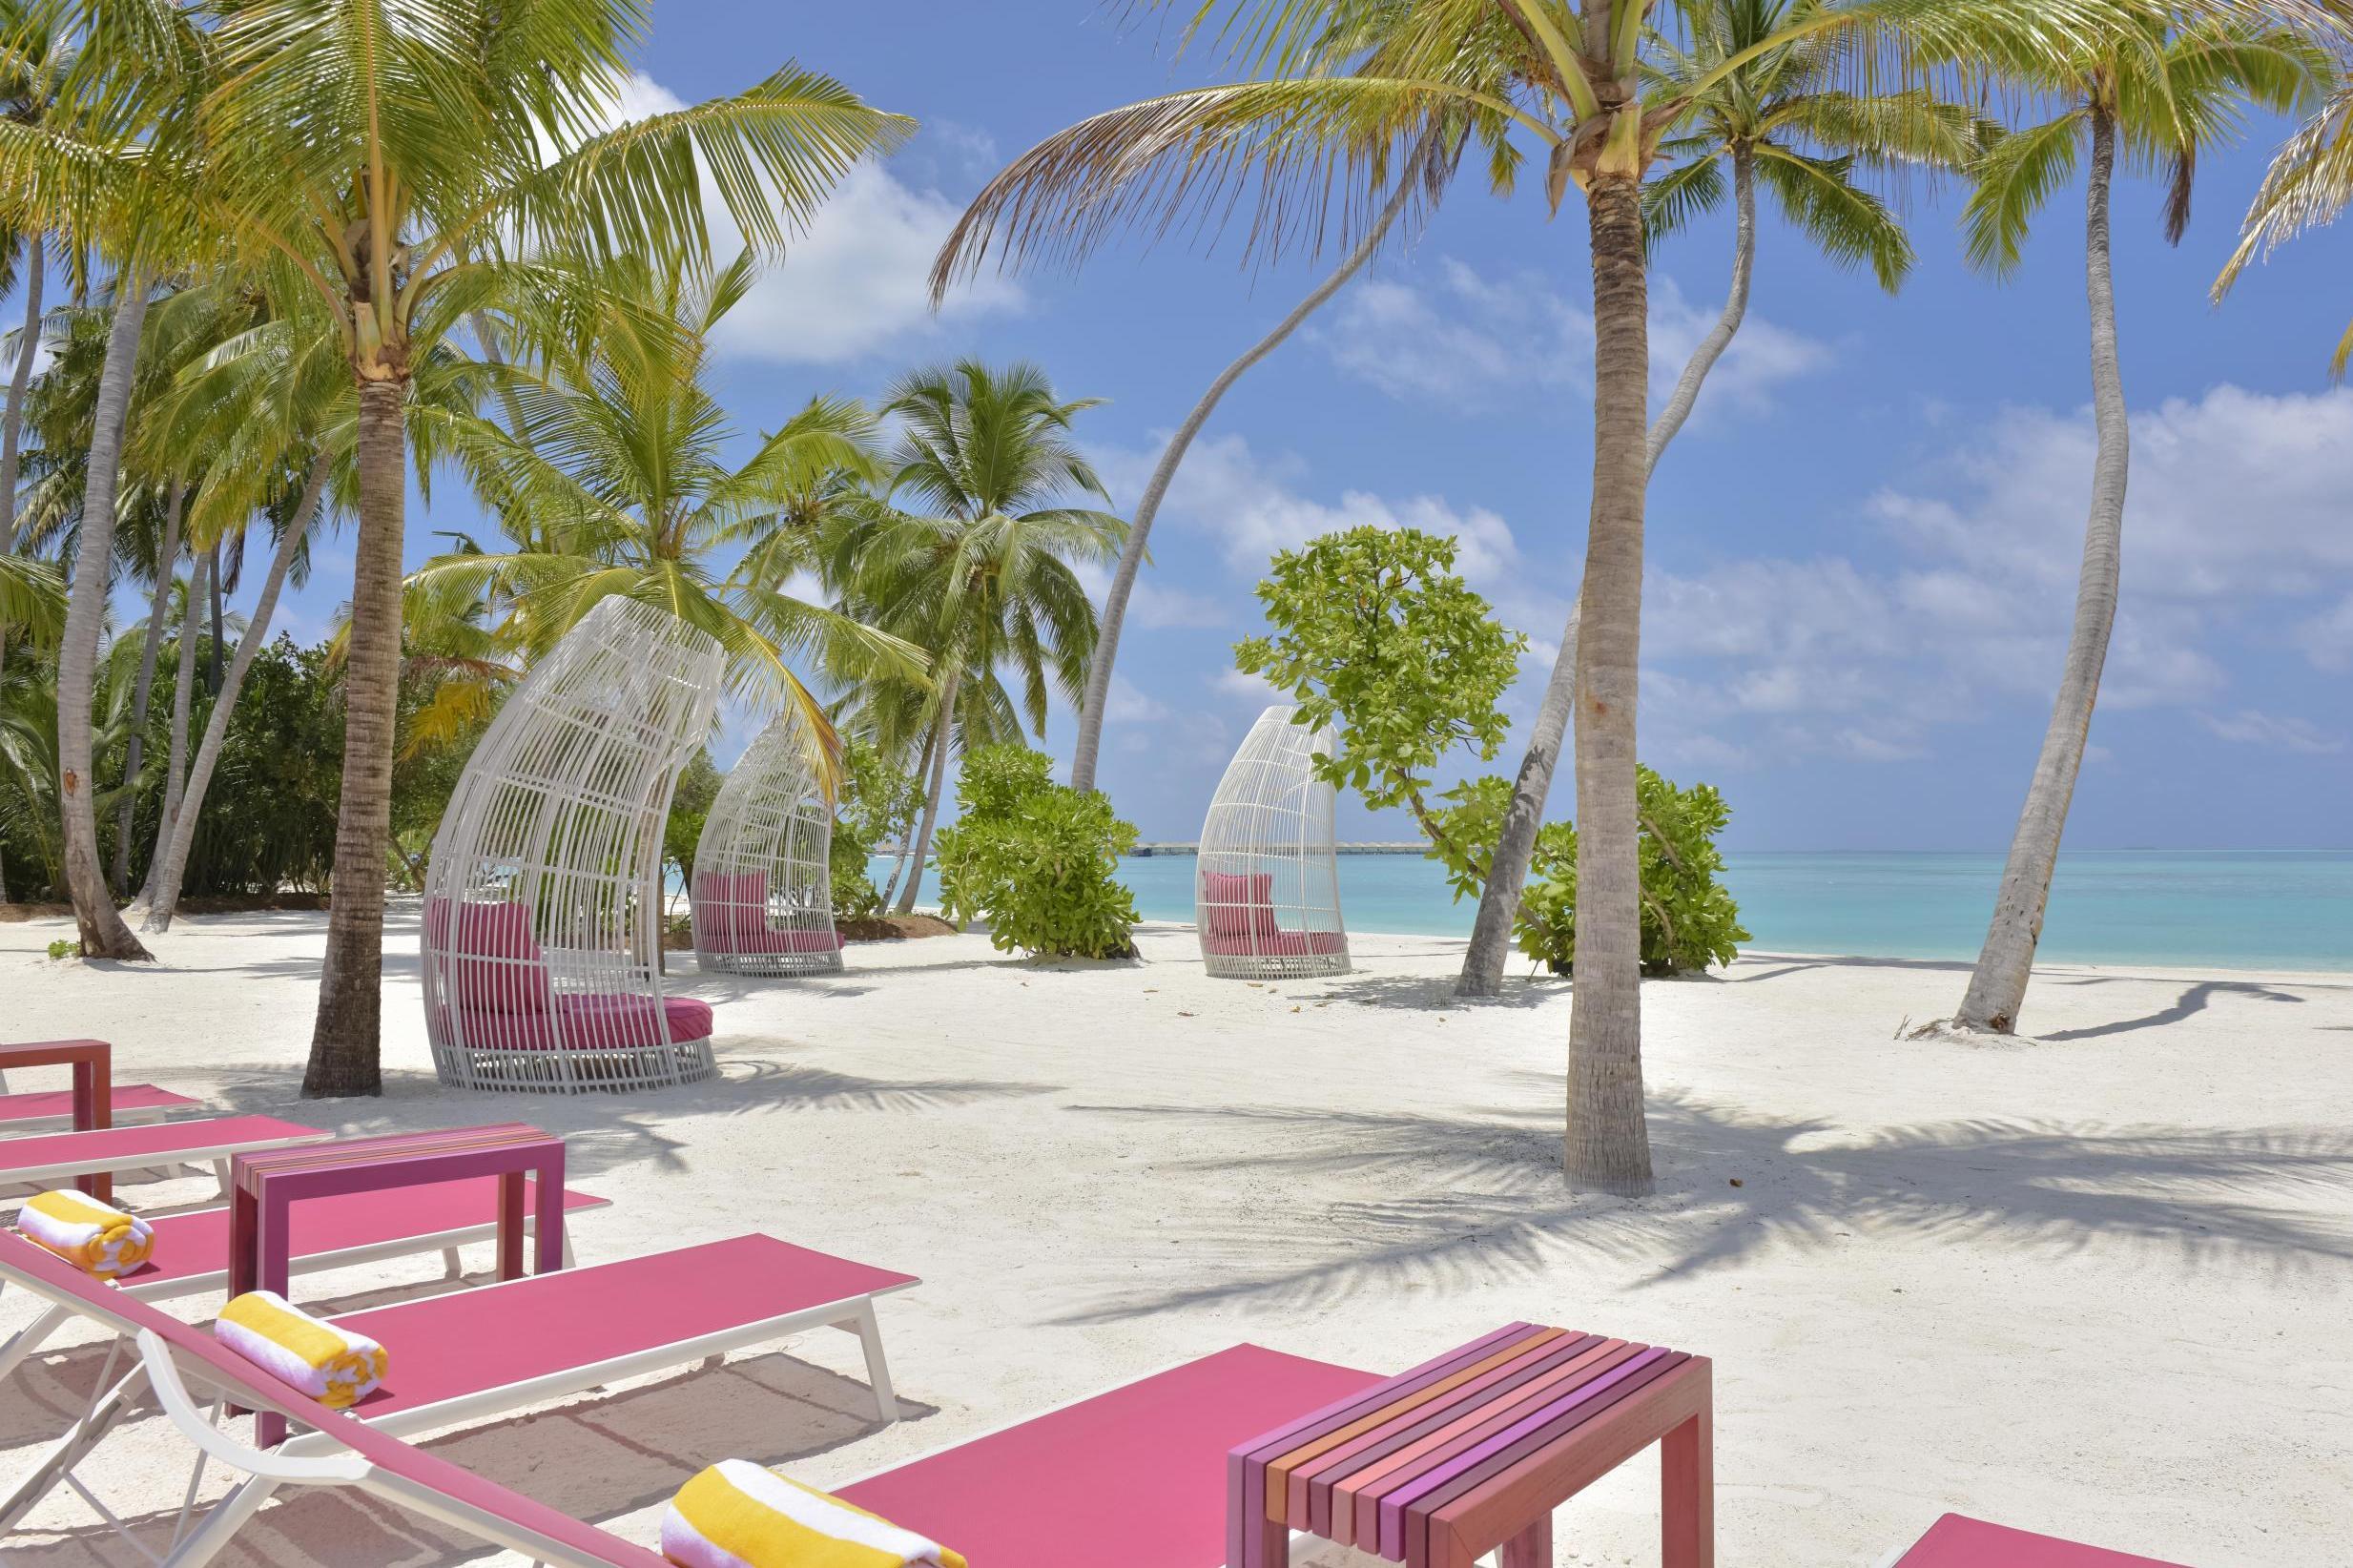 Kandima Maldives: Where action-packed meets laid-back luxury